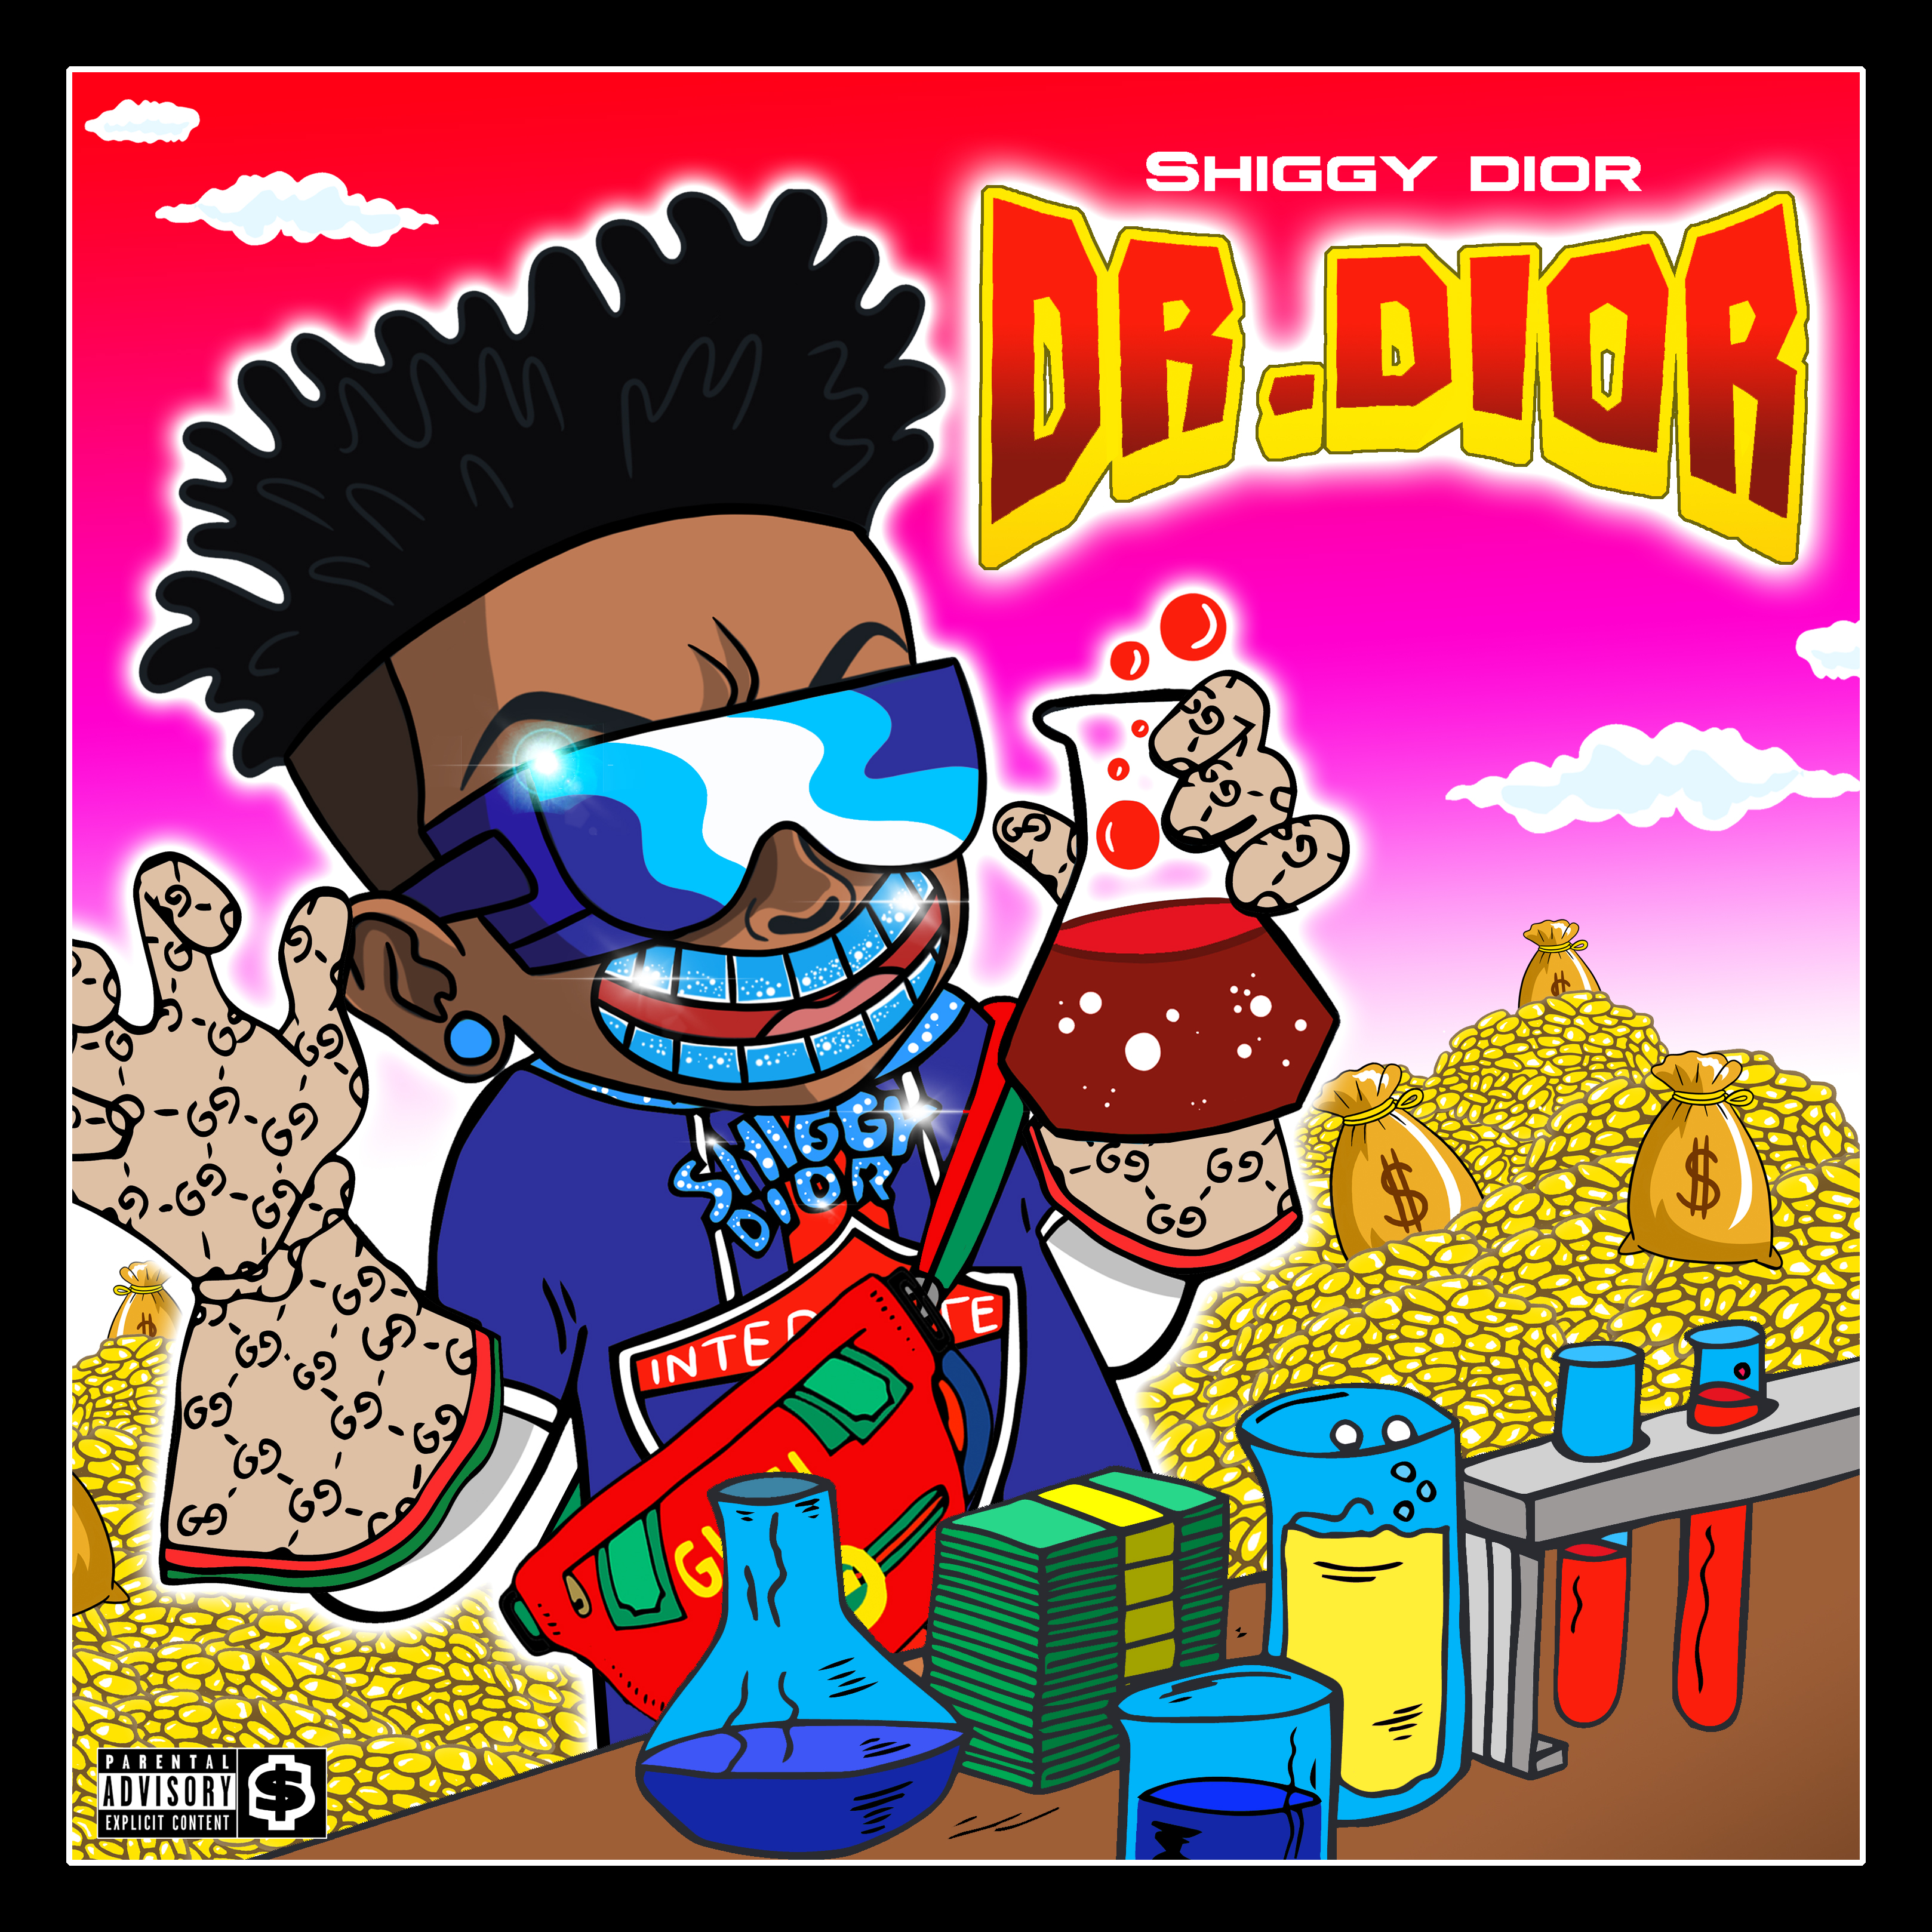 Shiggy_Dior-_Dr_Dior